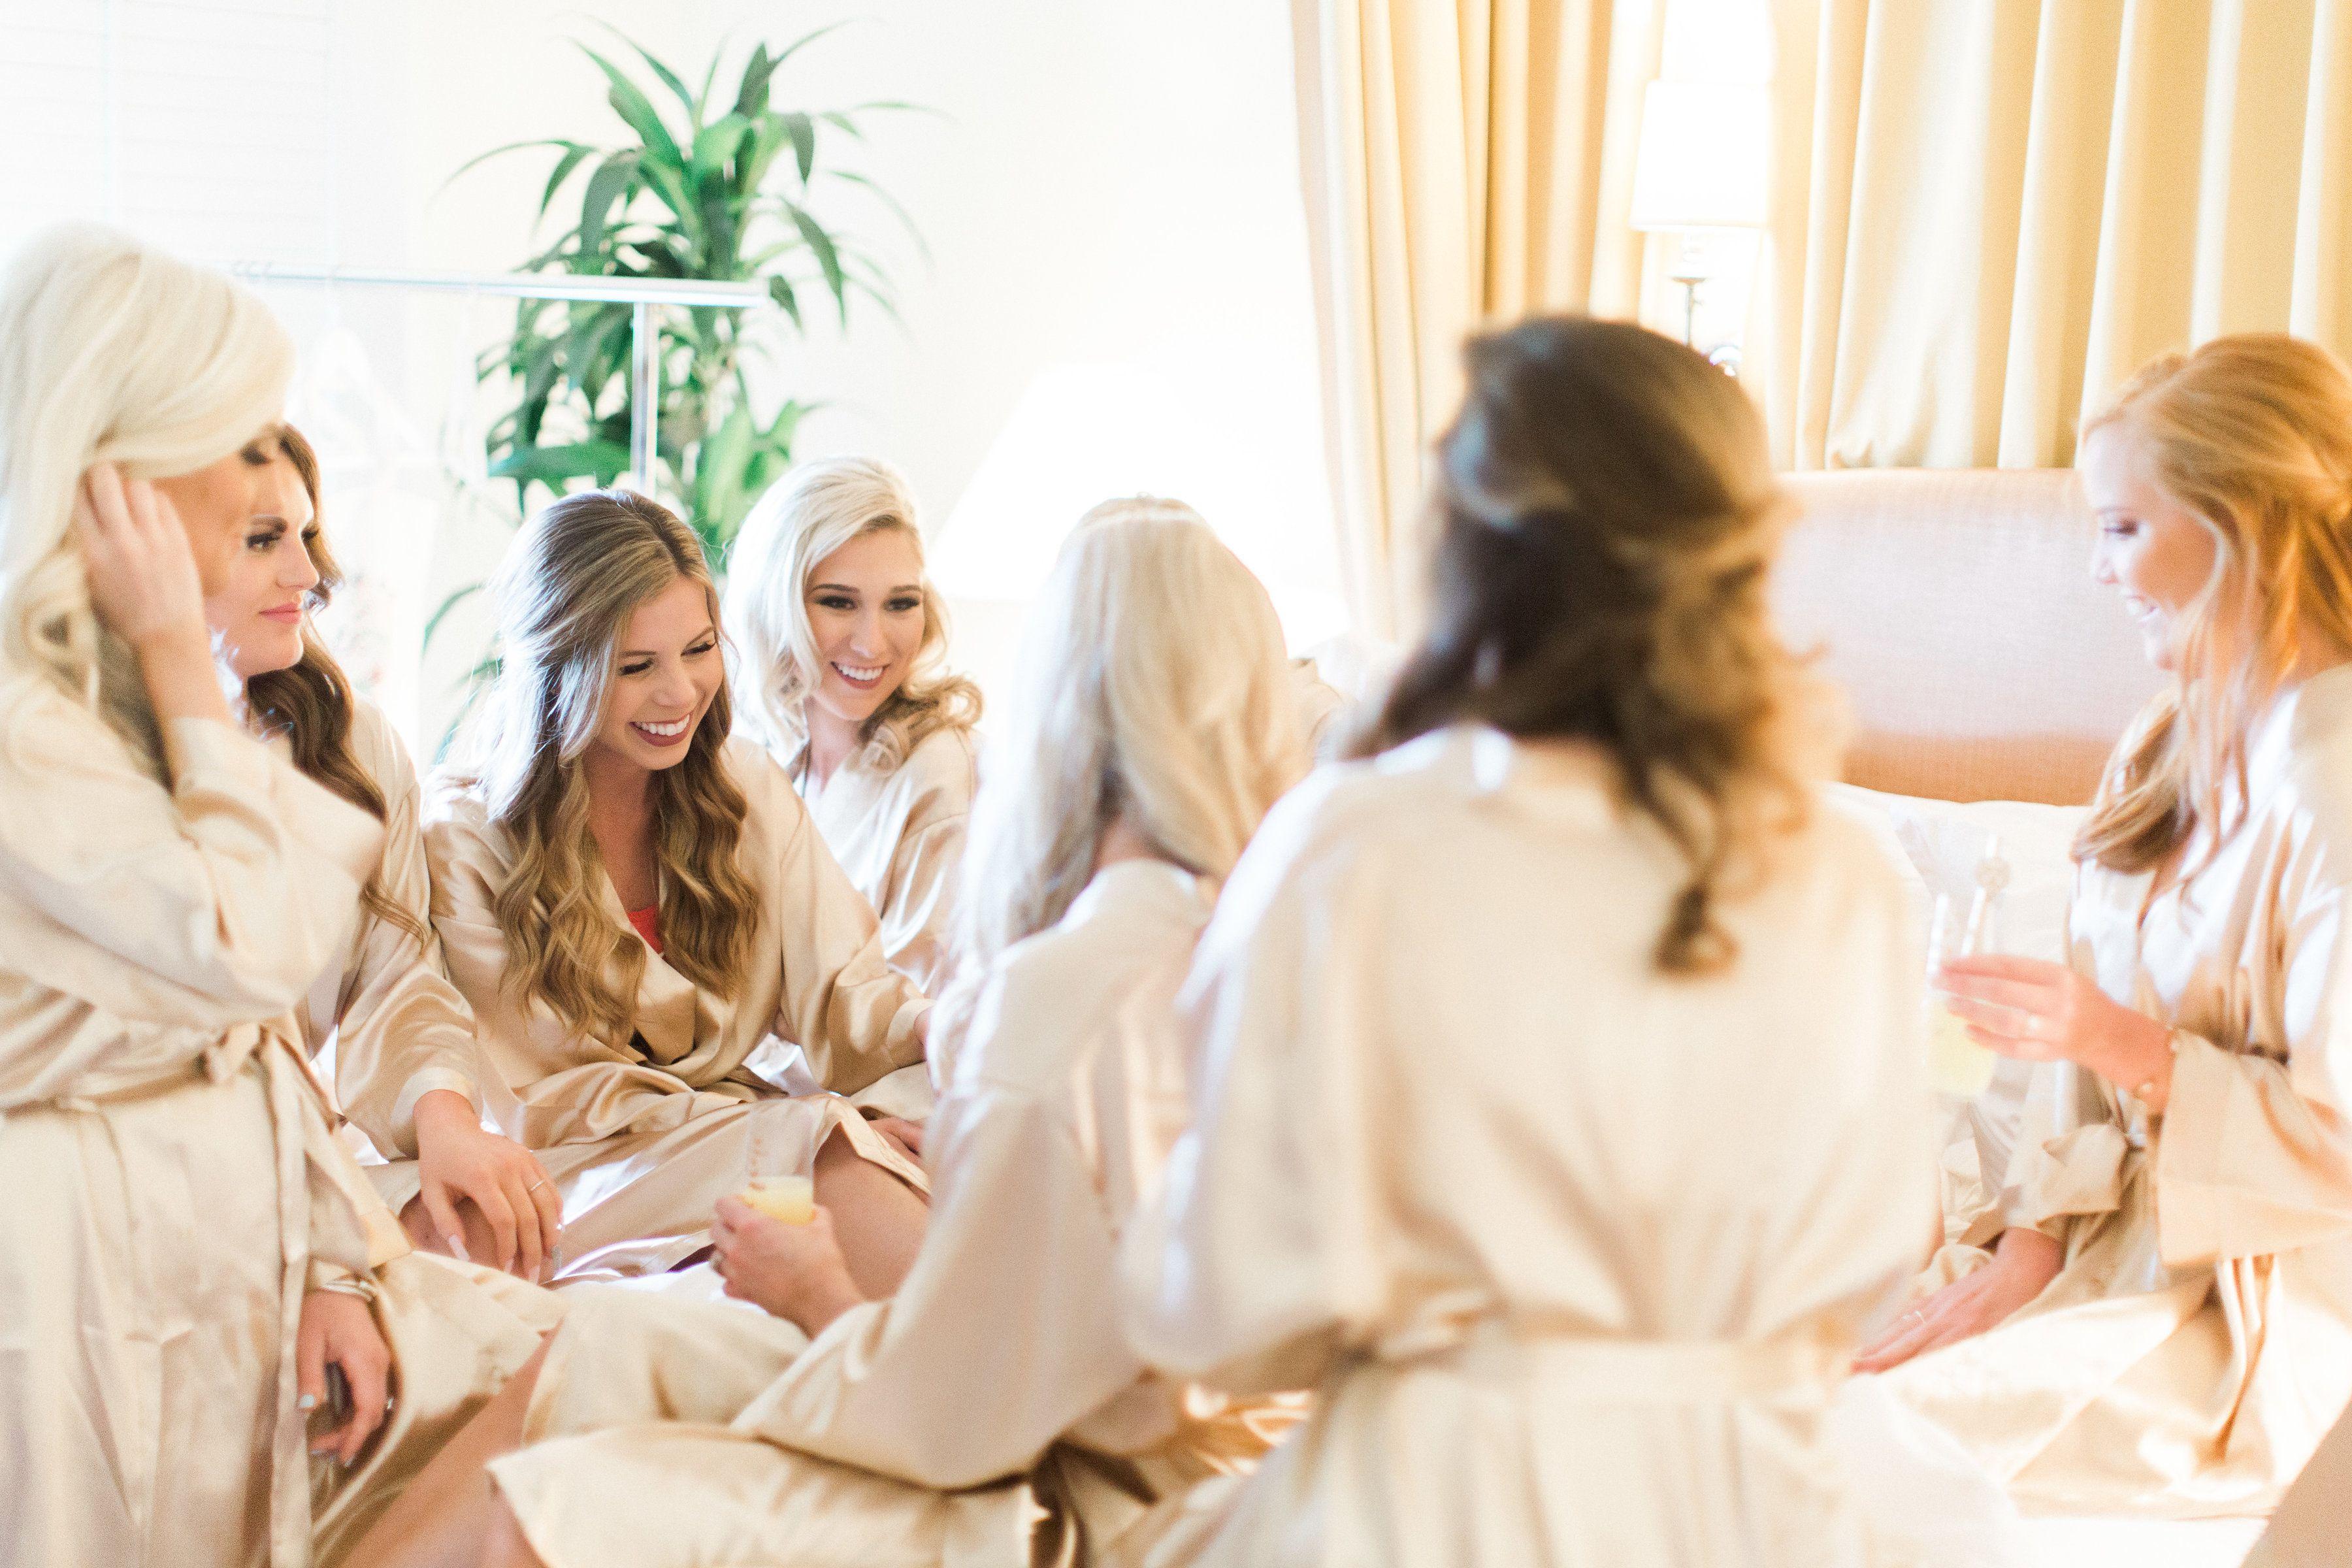 Kristin + Josh Spring Wedding at Four Seasons Dallas   Tracy Enoch Photography